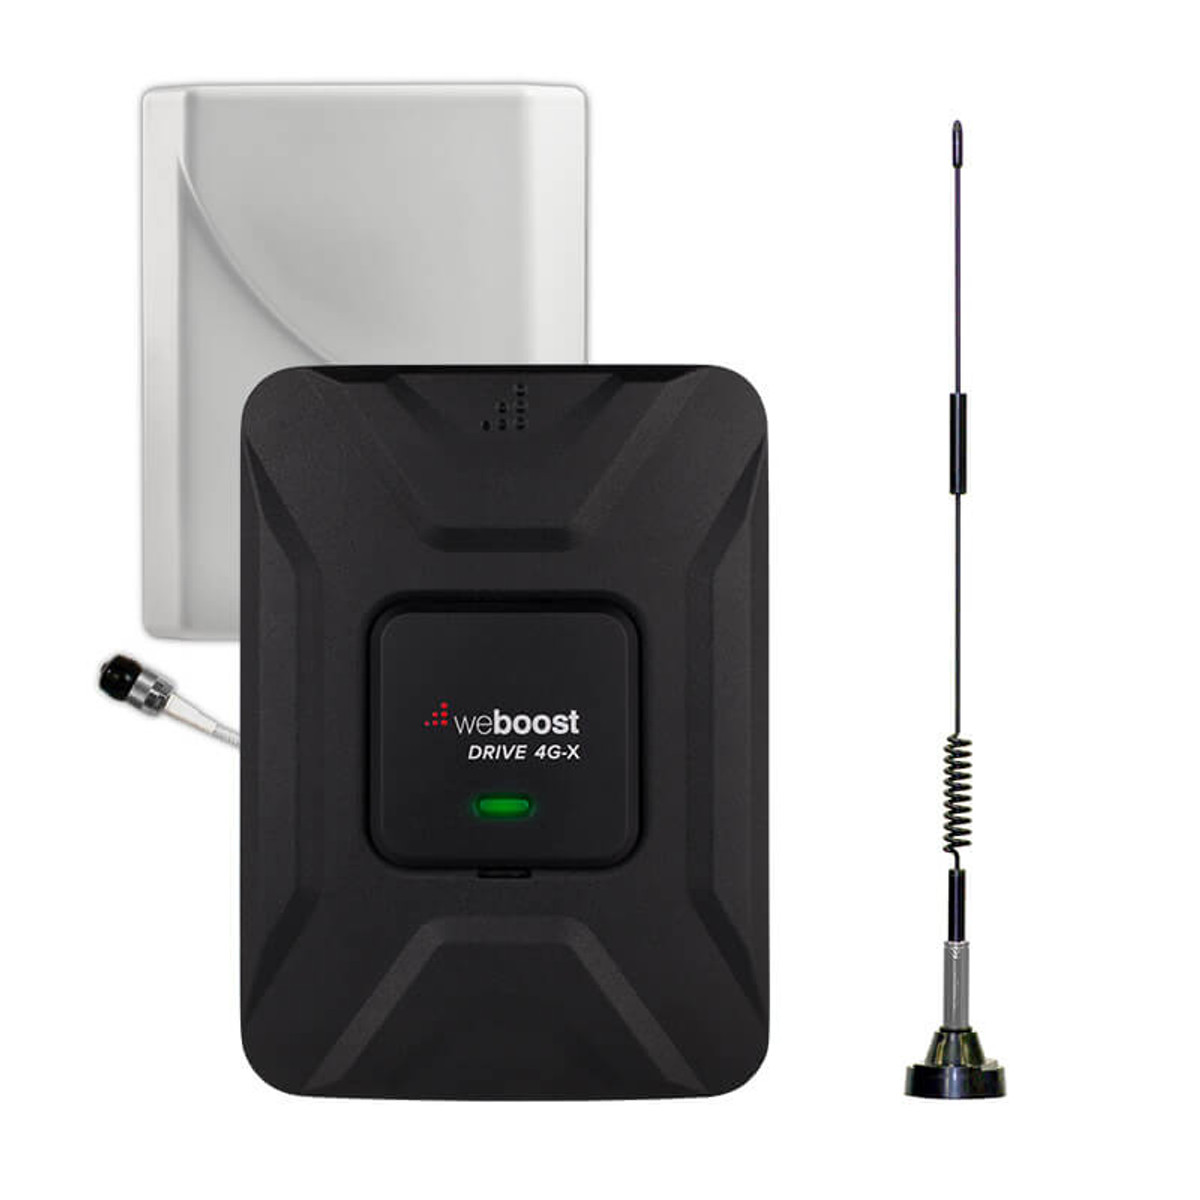 Wilson weBoost Drive 4G-X + Ambulance Kit